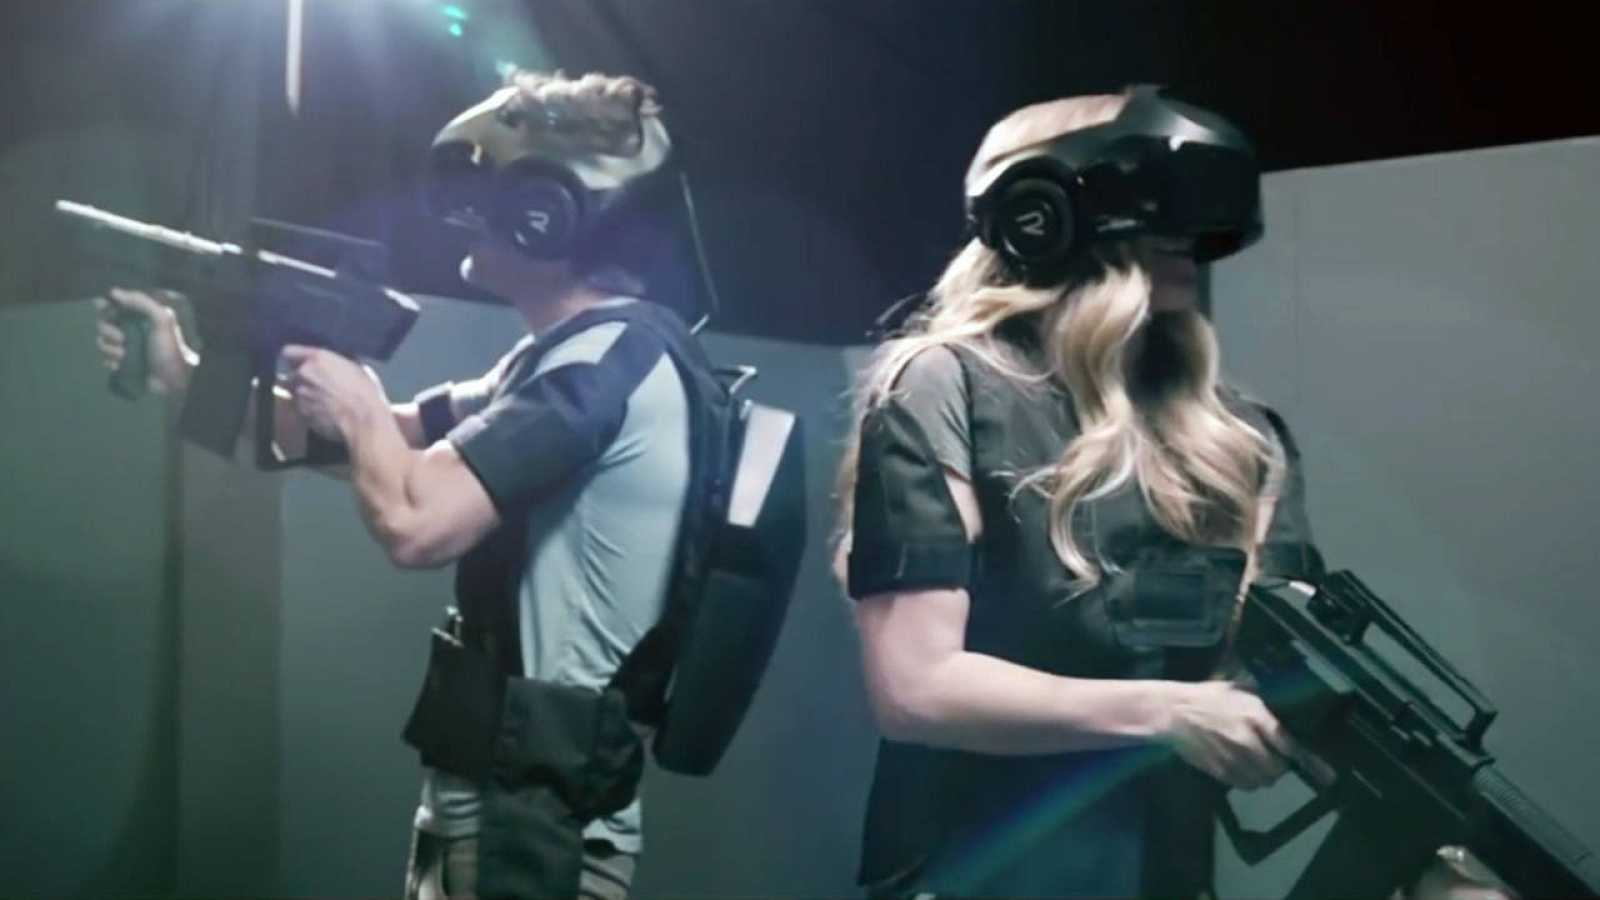 Realidad Virtual Y Entretenimiento 16 | Virtual Reality And Entertainment 16